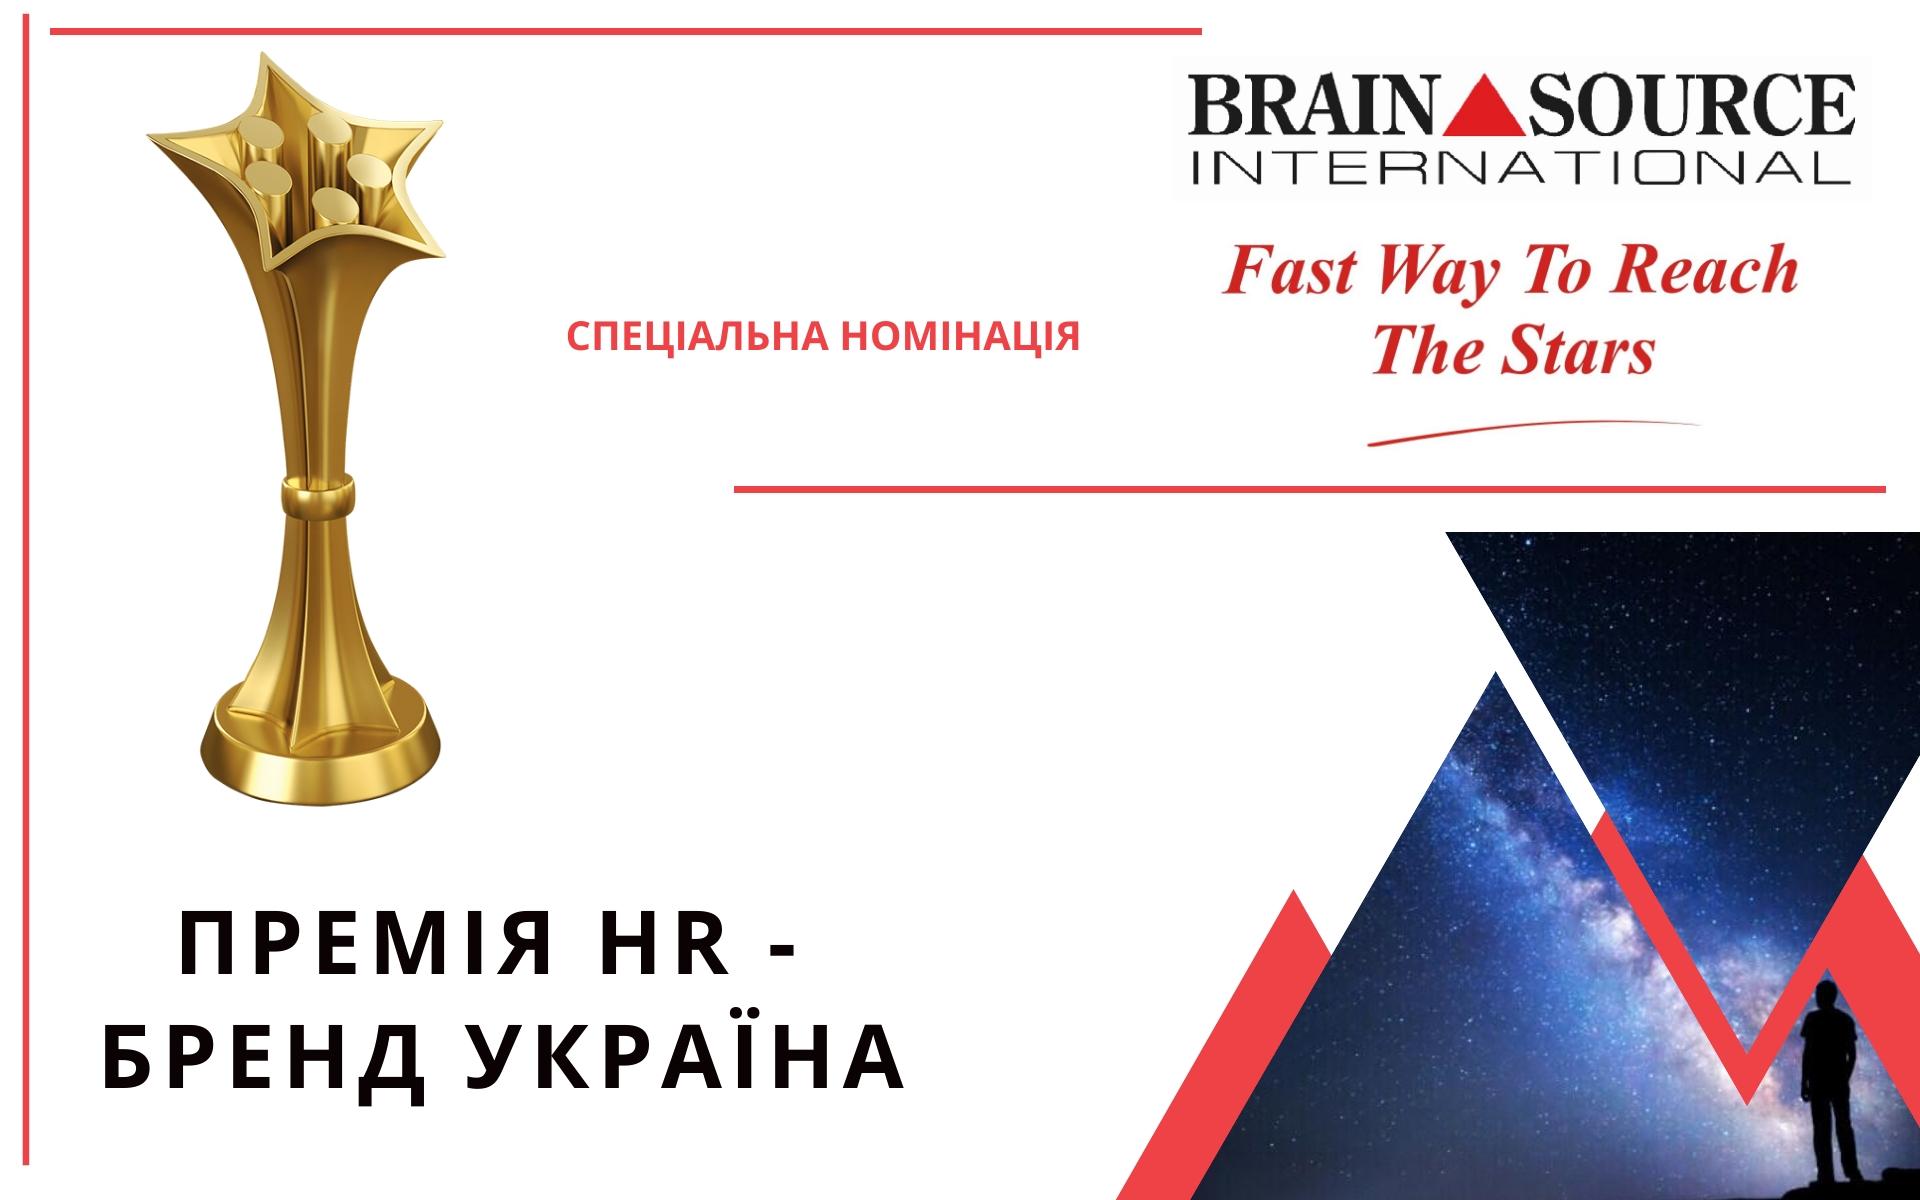 Номінація від «BRAIN SOURCE INTERNATIONAL» – «Fast Way To Reach The Stars»